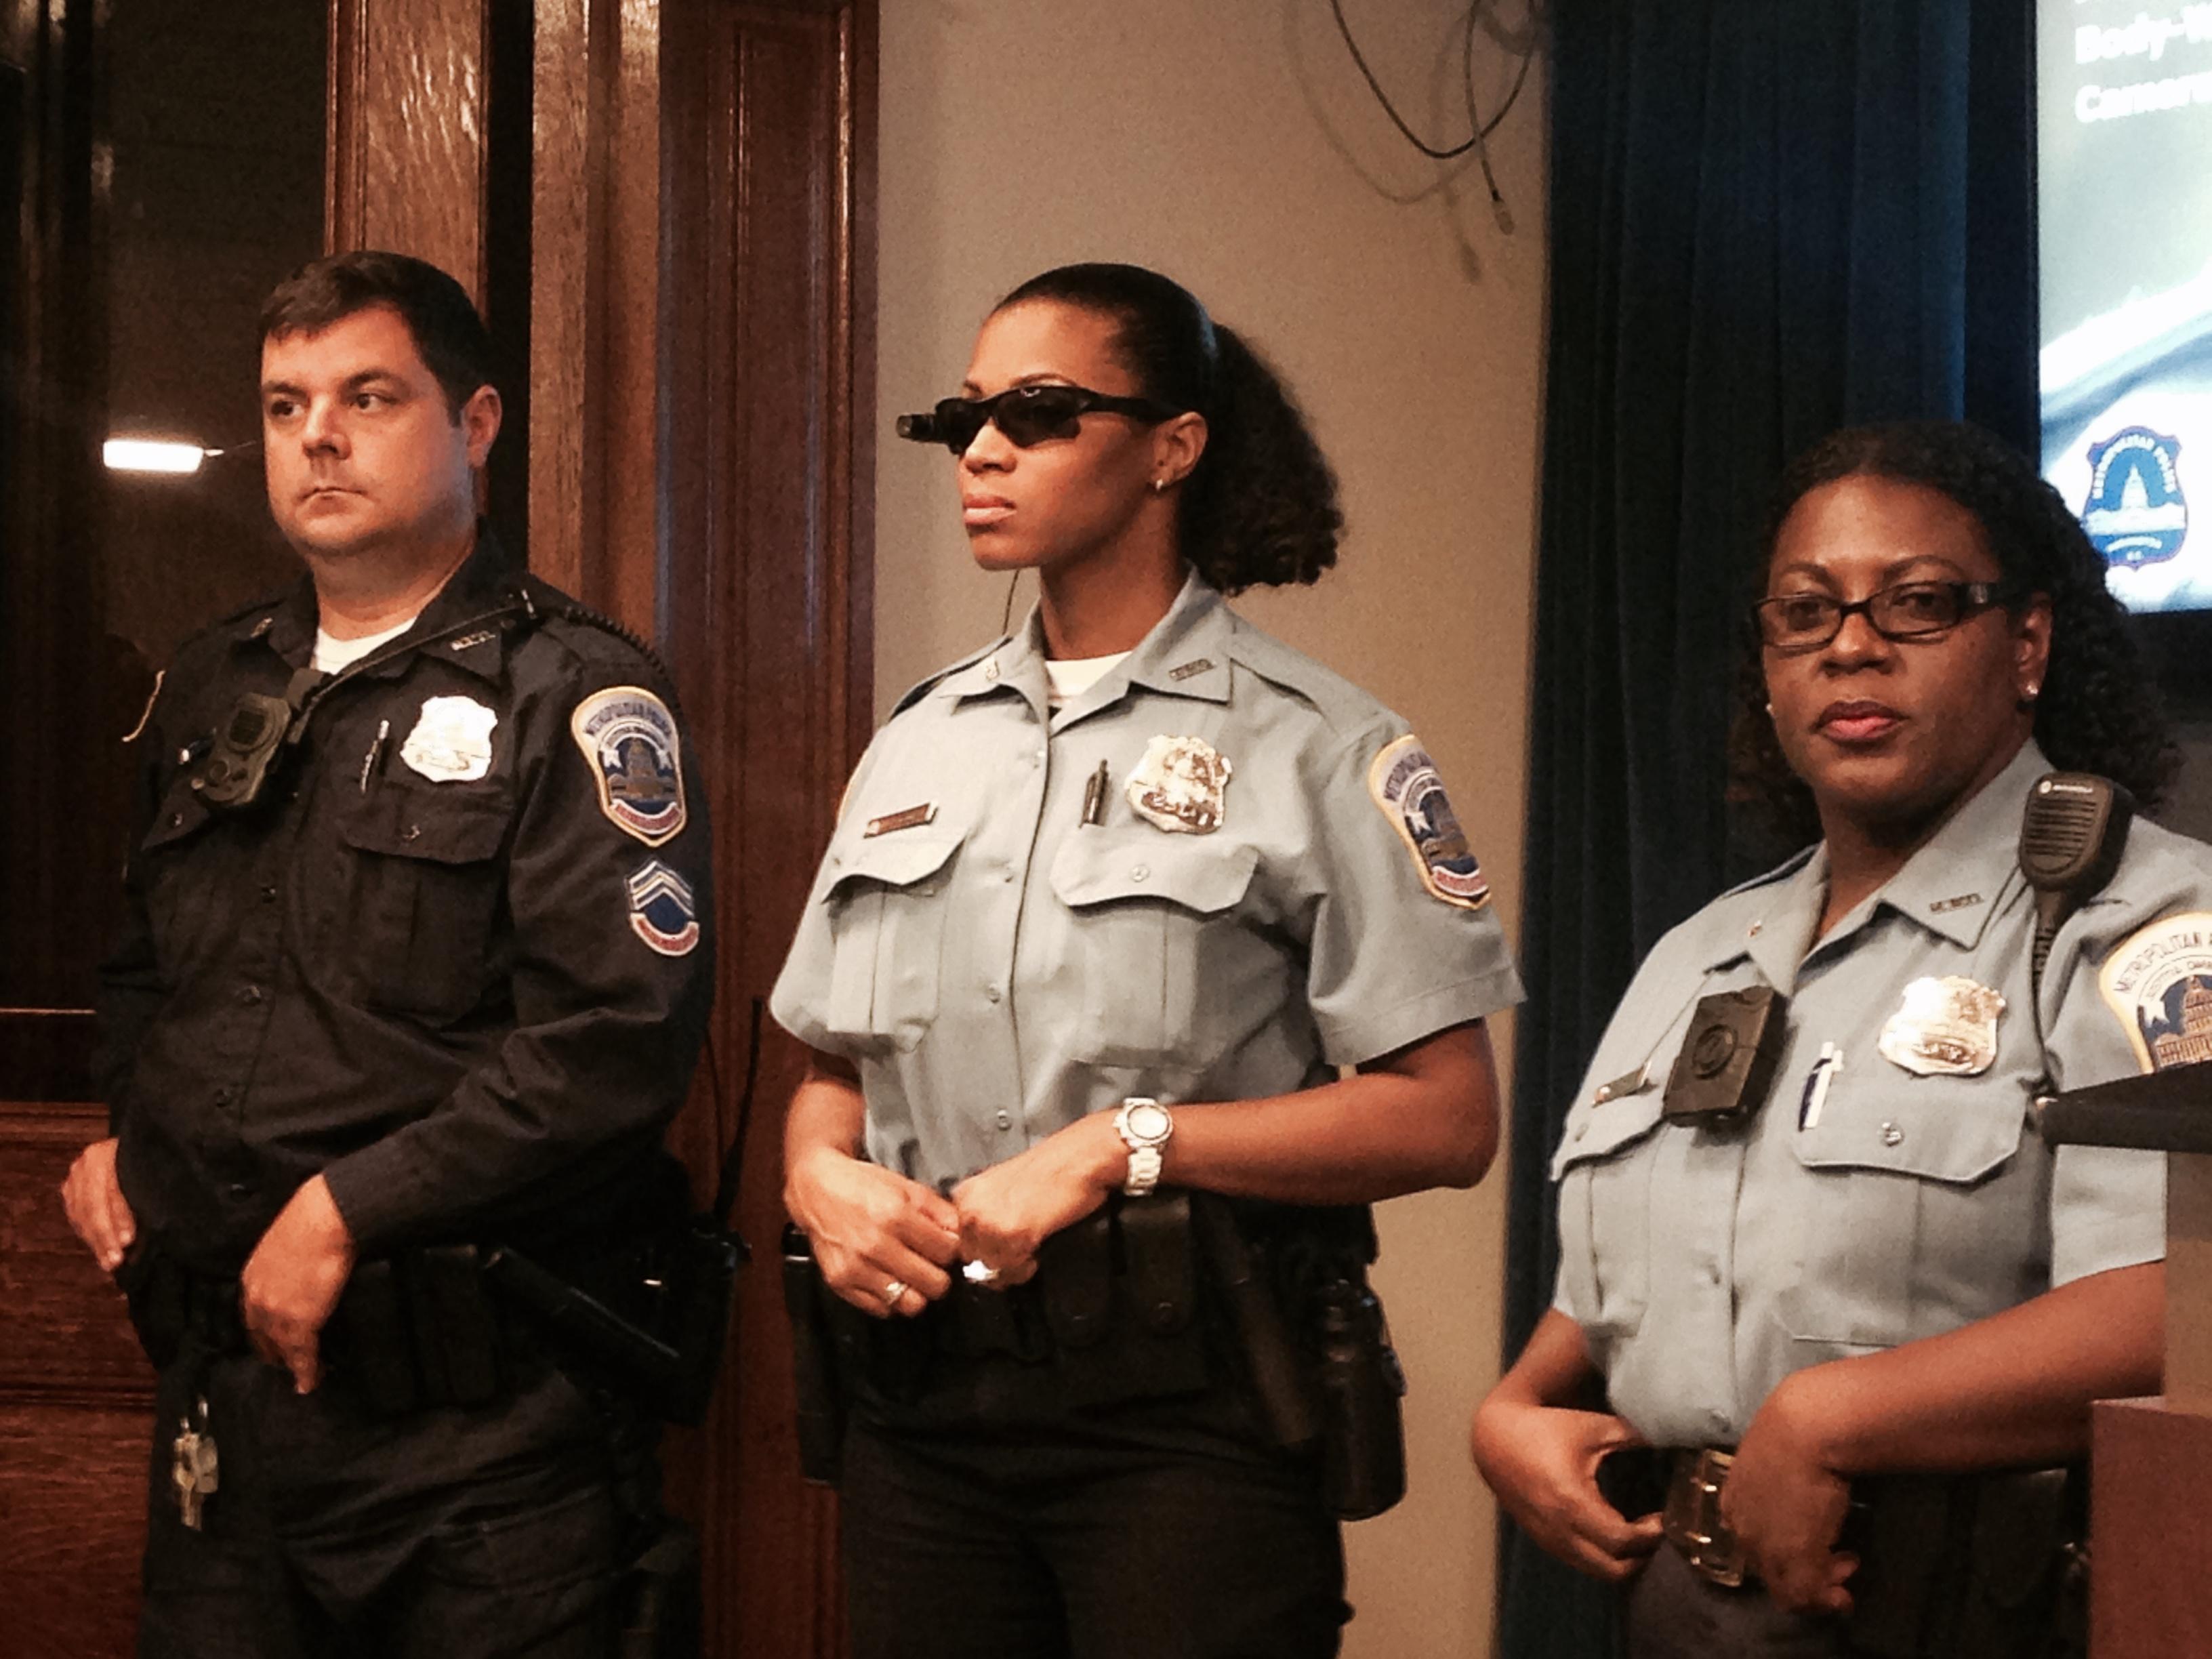 Controversial amendment included in D.C. police body camera vote